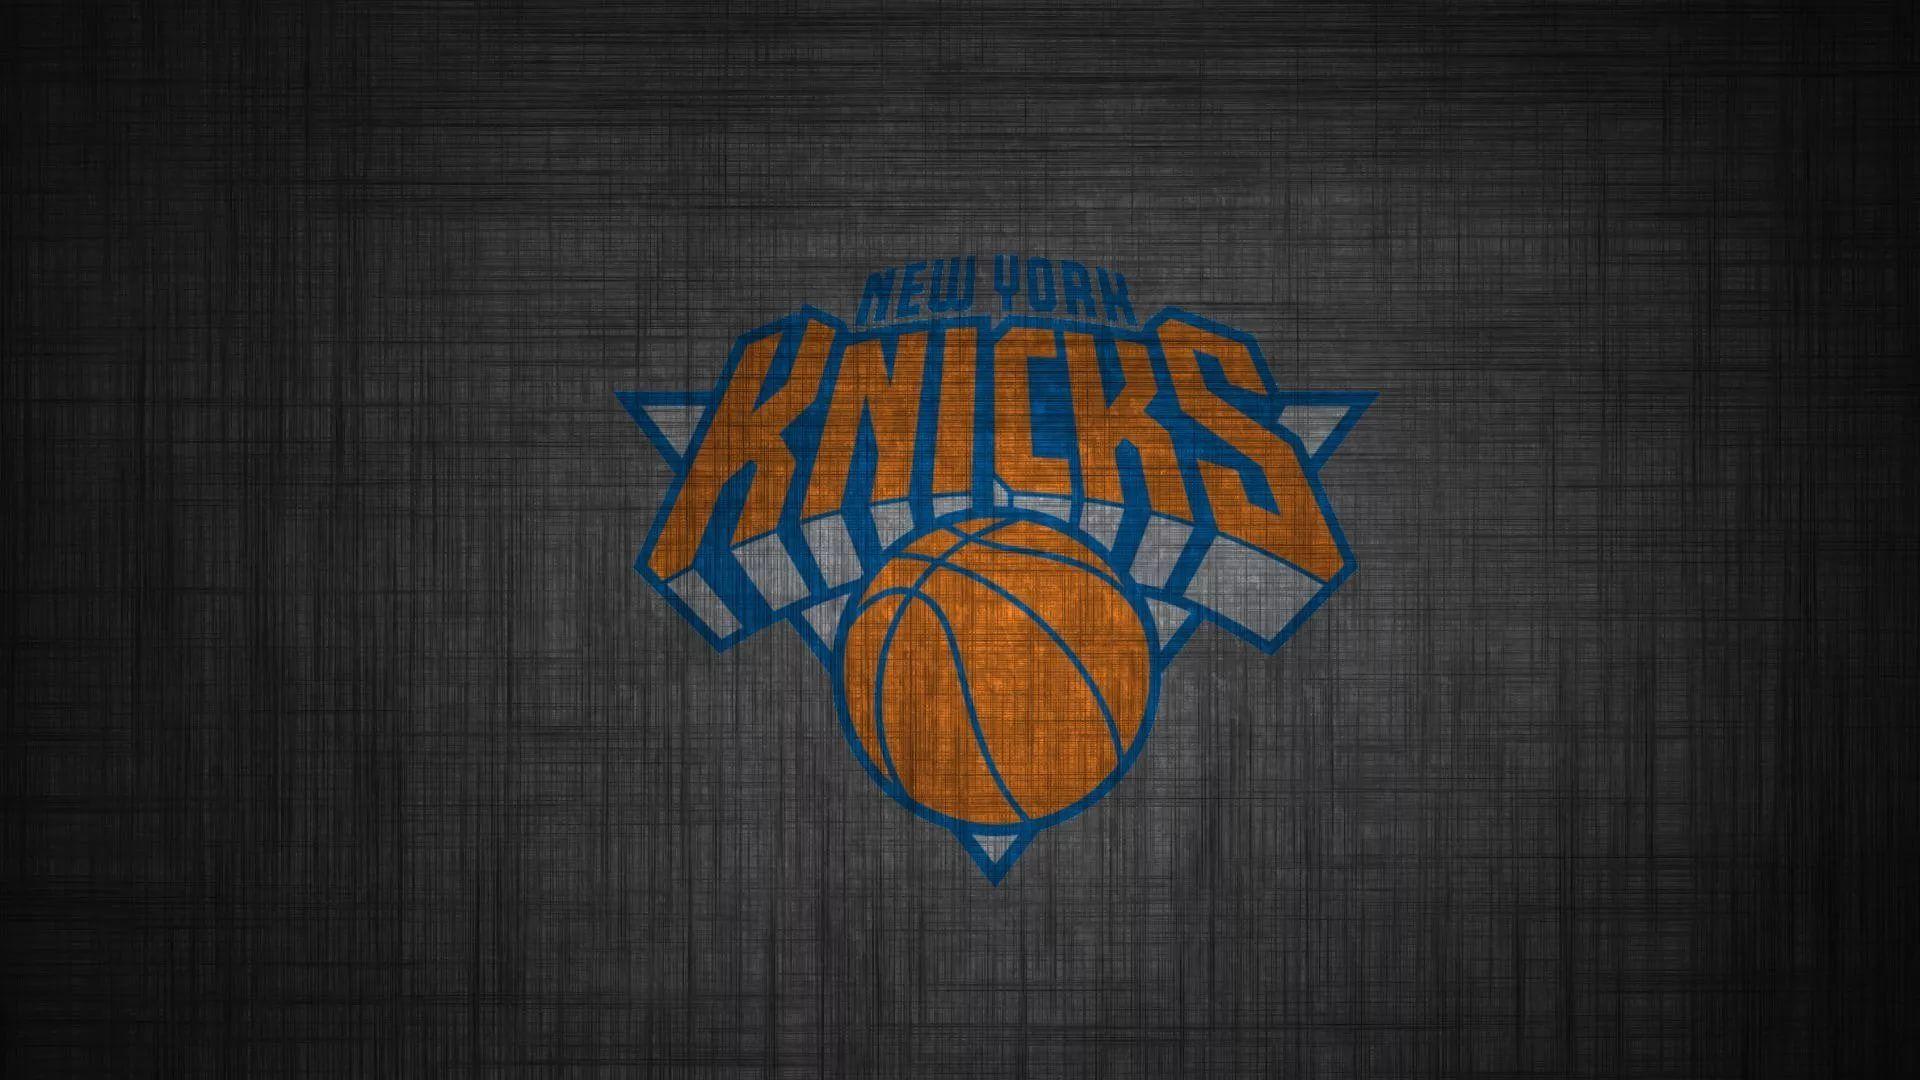 New York Knicks new wallpaper